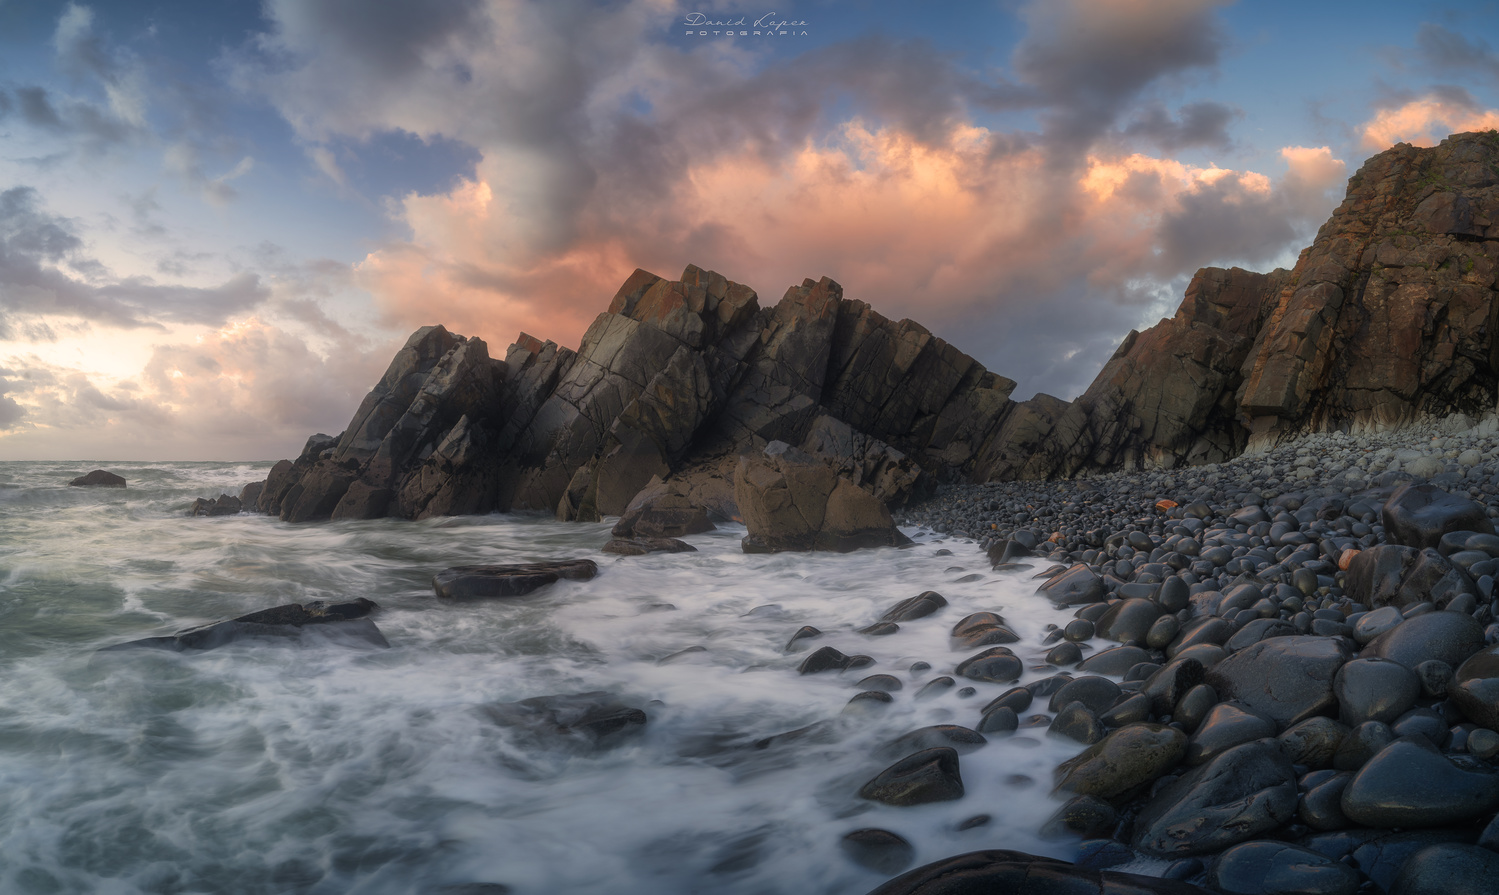 Asturias by David López García